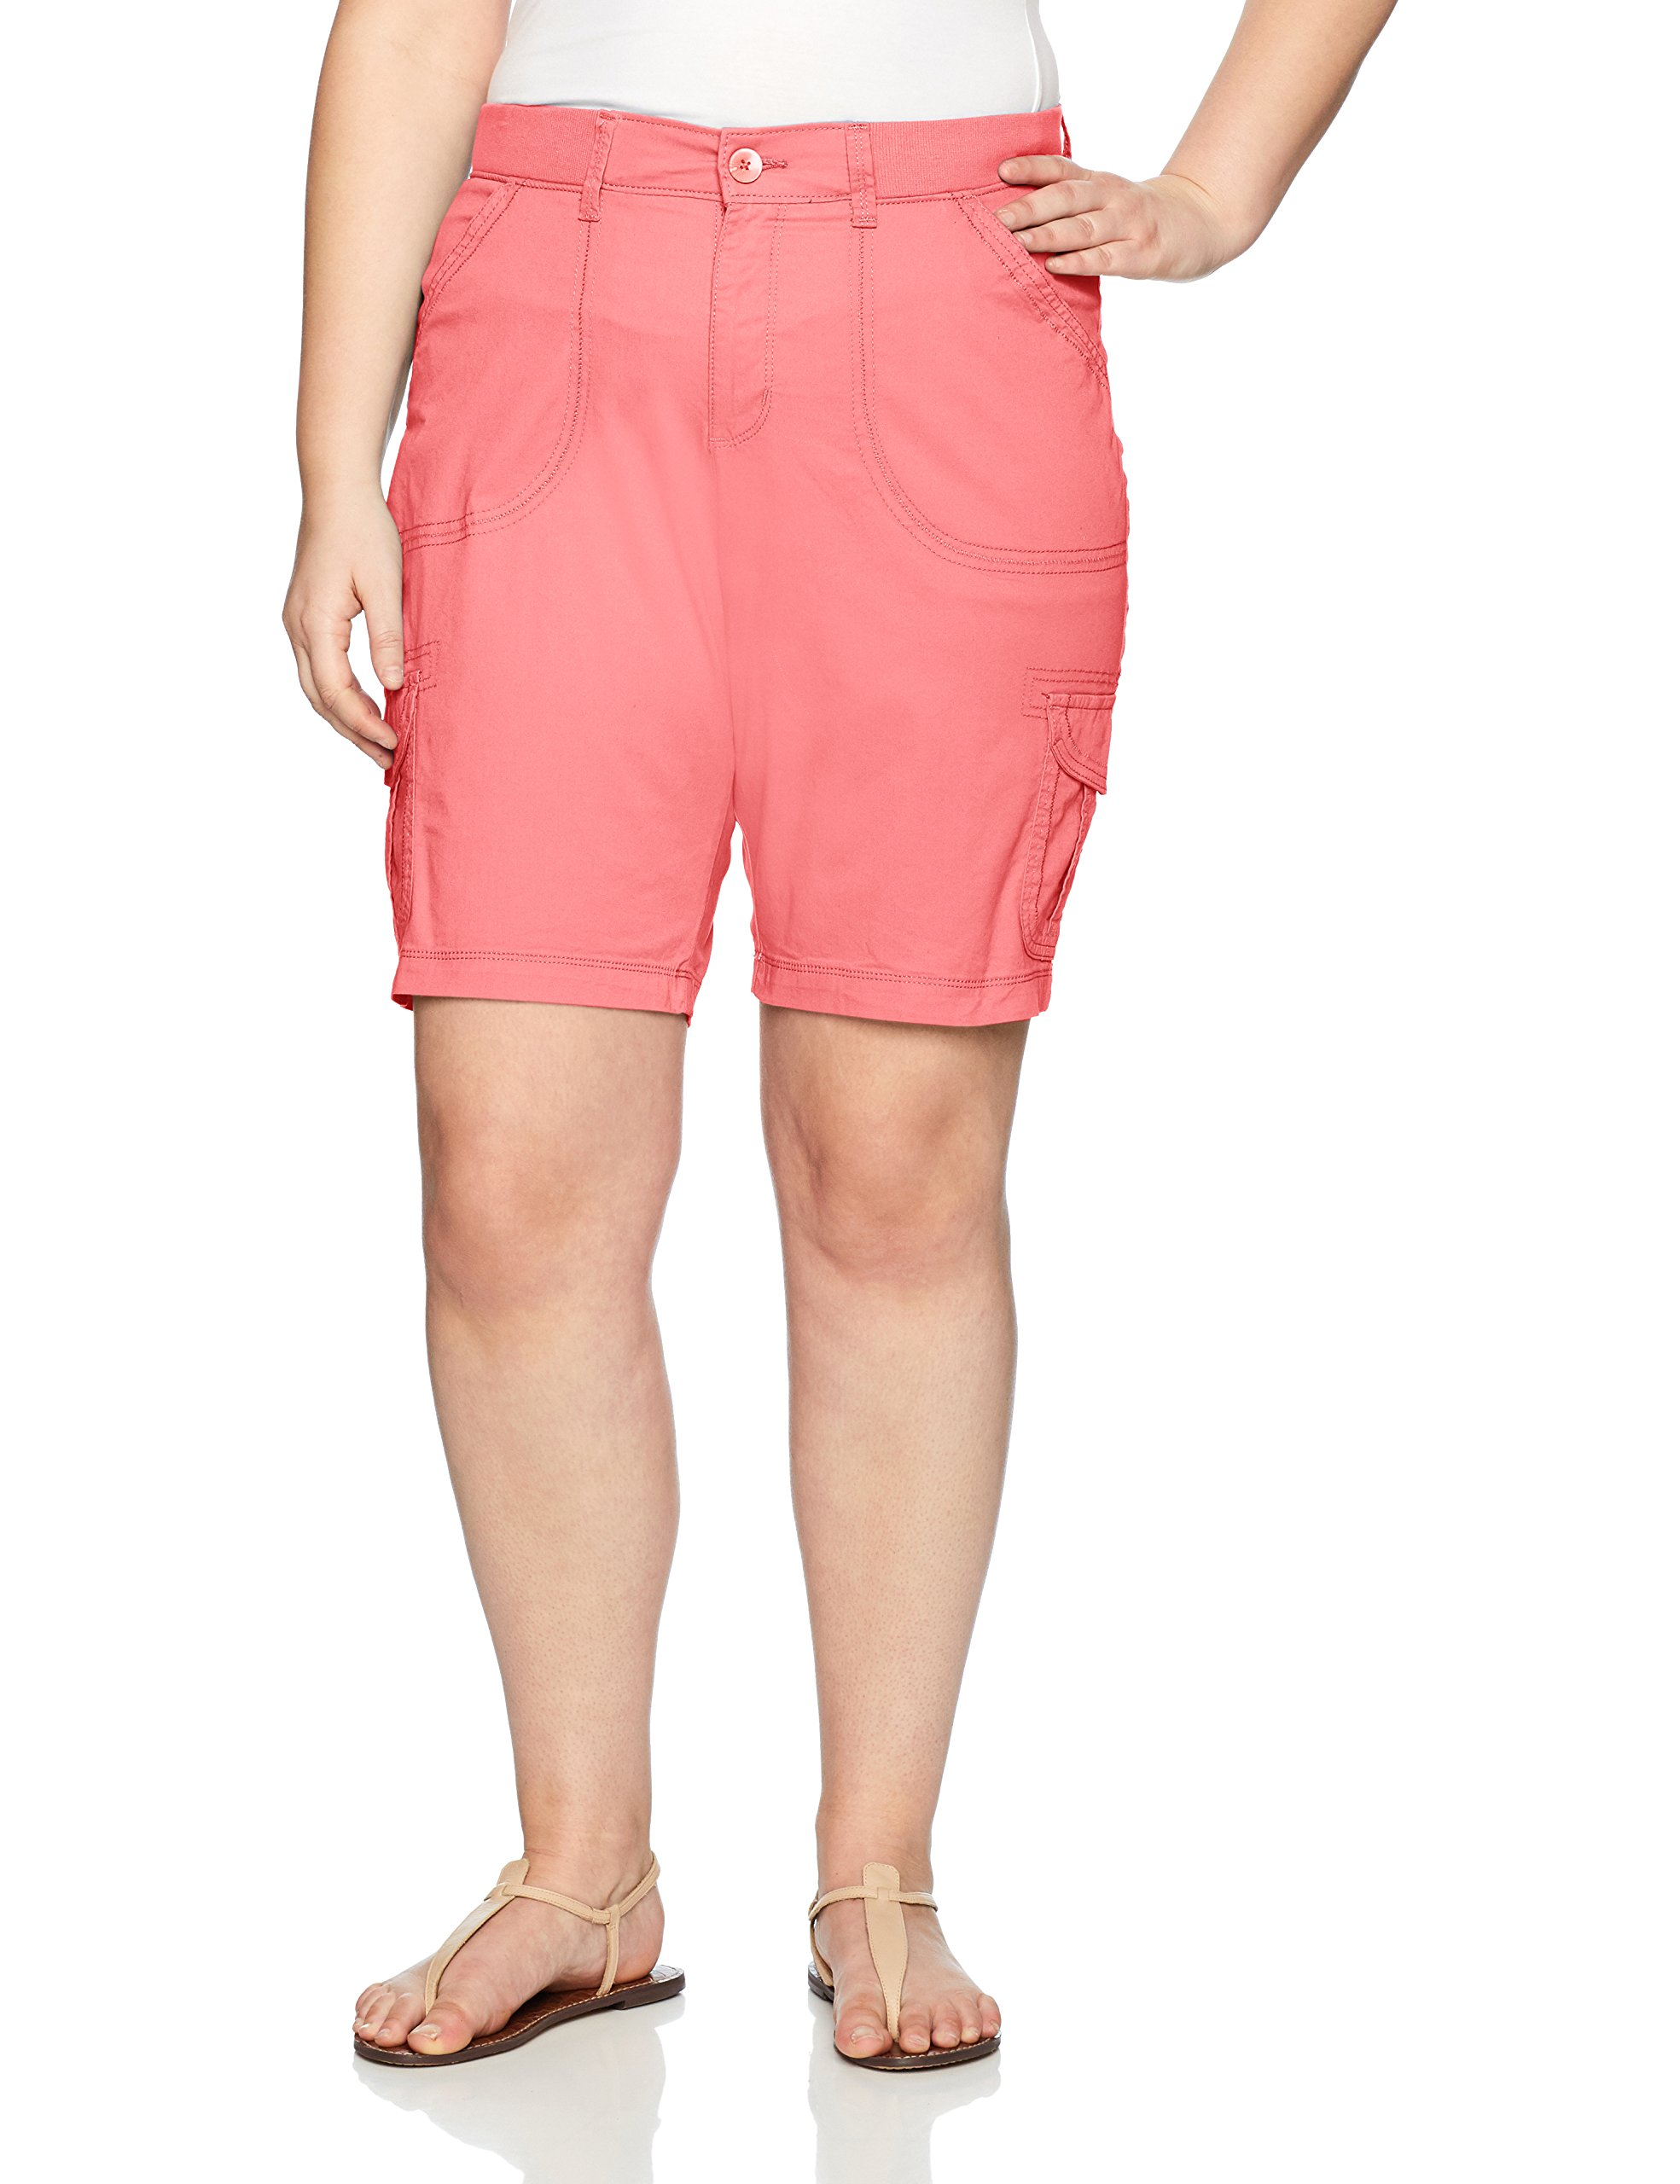 LEE Women's Plus Size Relaxed Fit Diani Knit Waist Bermuda Short, Peony Pink, 18W Medium